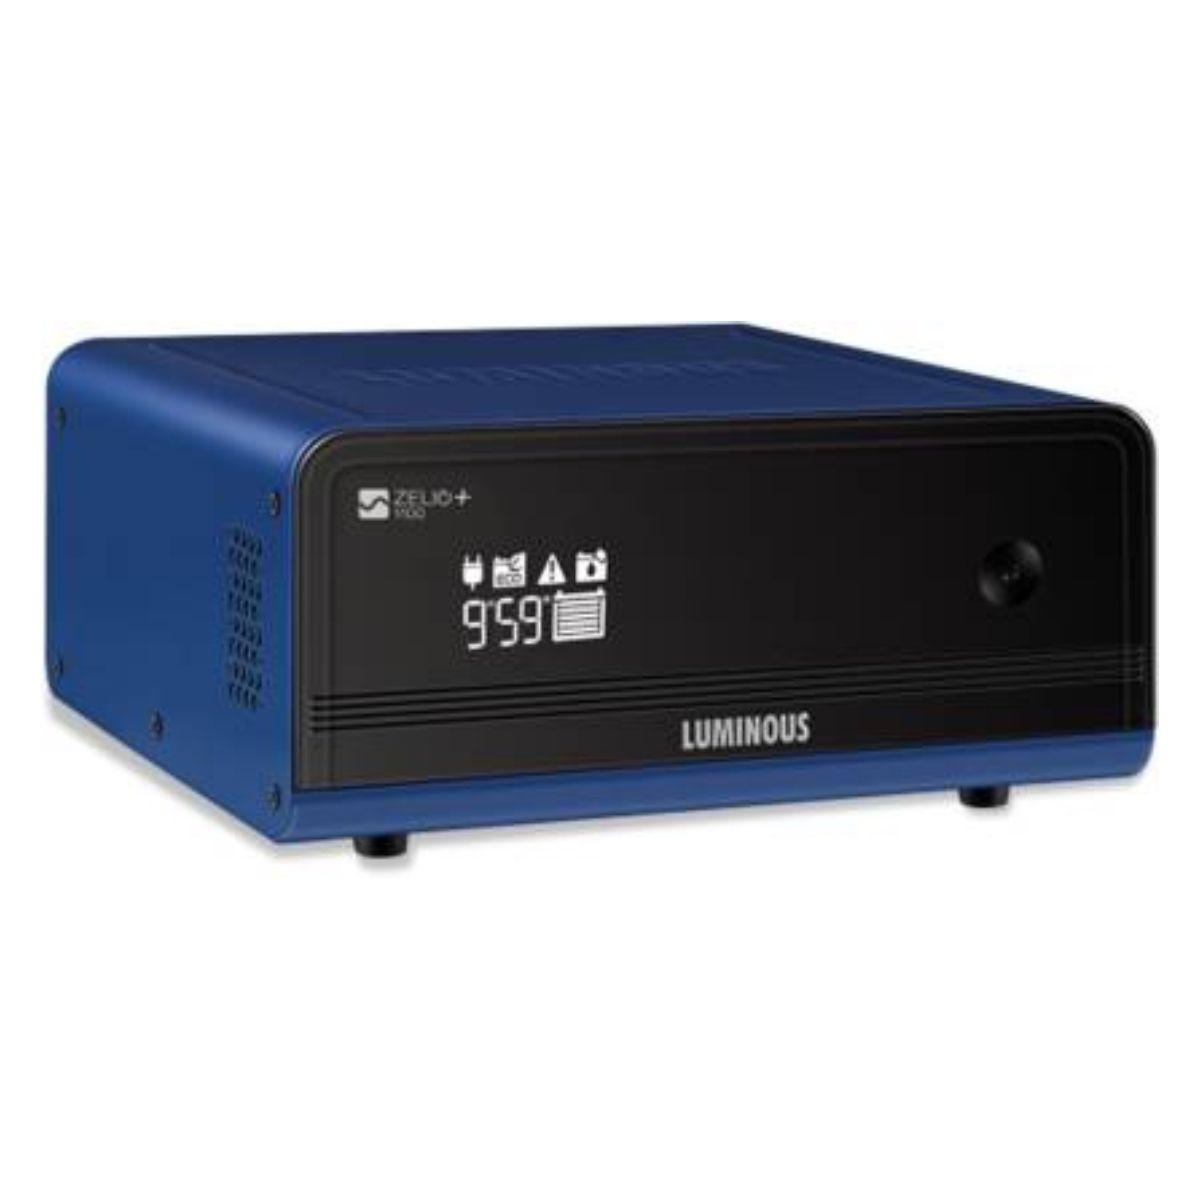 LUMINOUS Zelio+ 1100/12V Pure Sine Wave Inverter